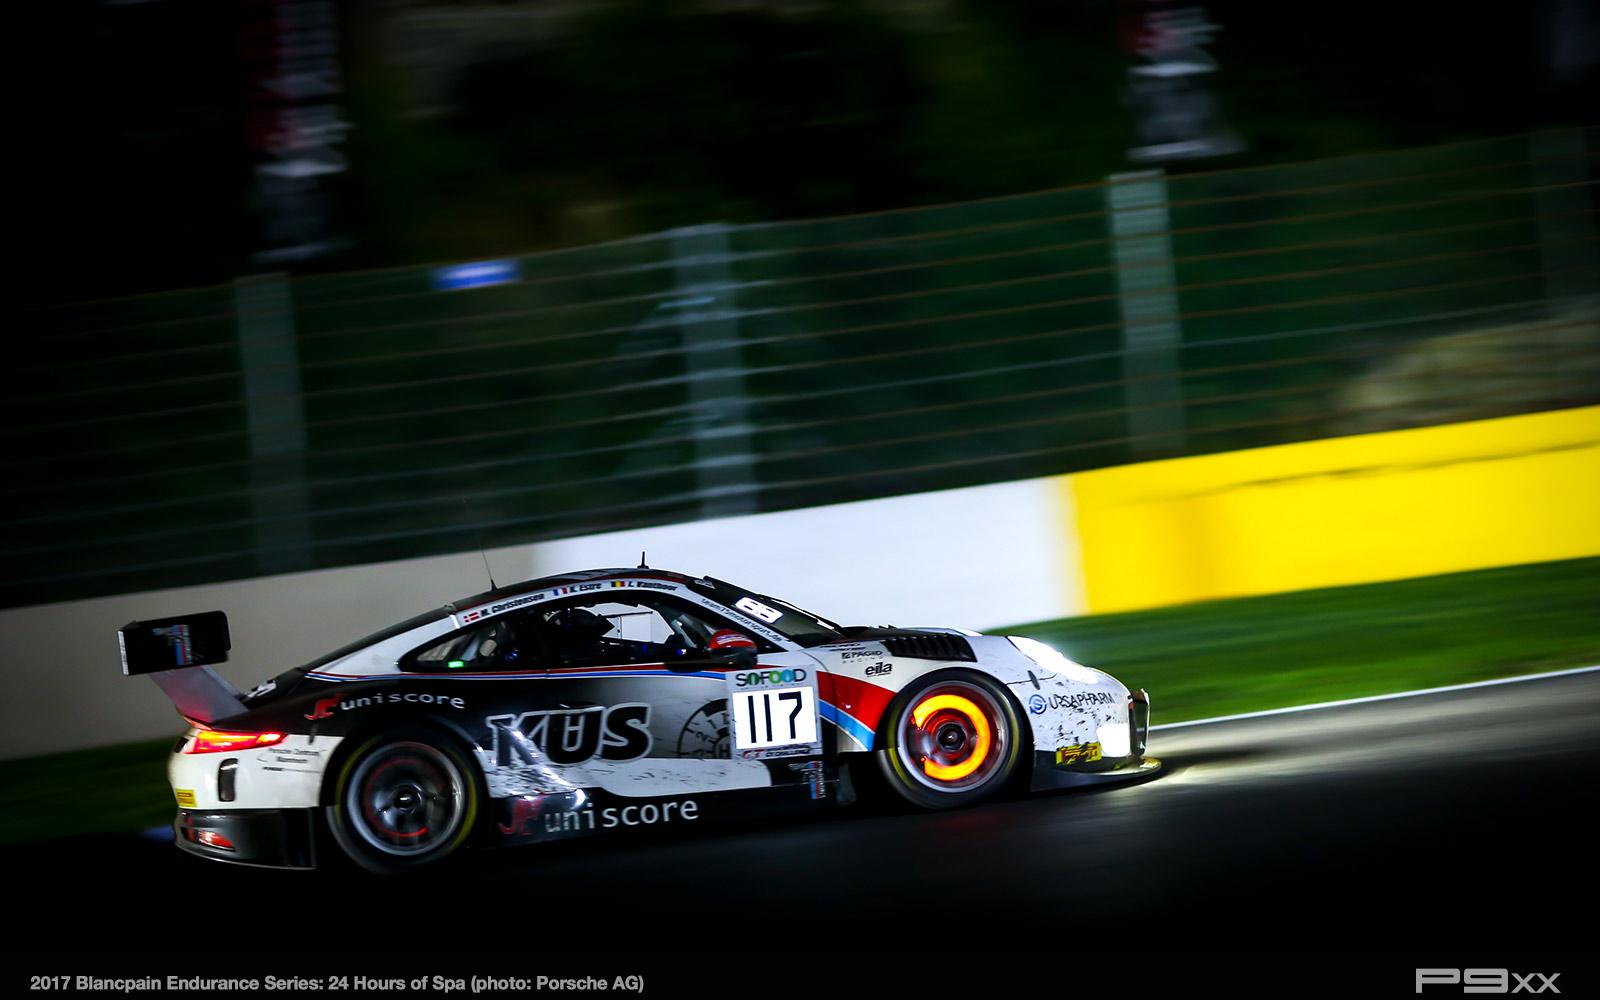 2017-24-Hours-of-Spa-Porsche-361